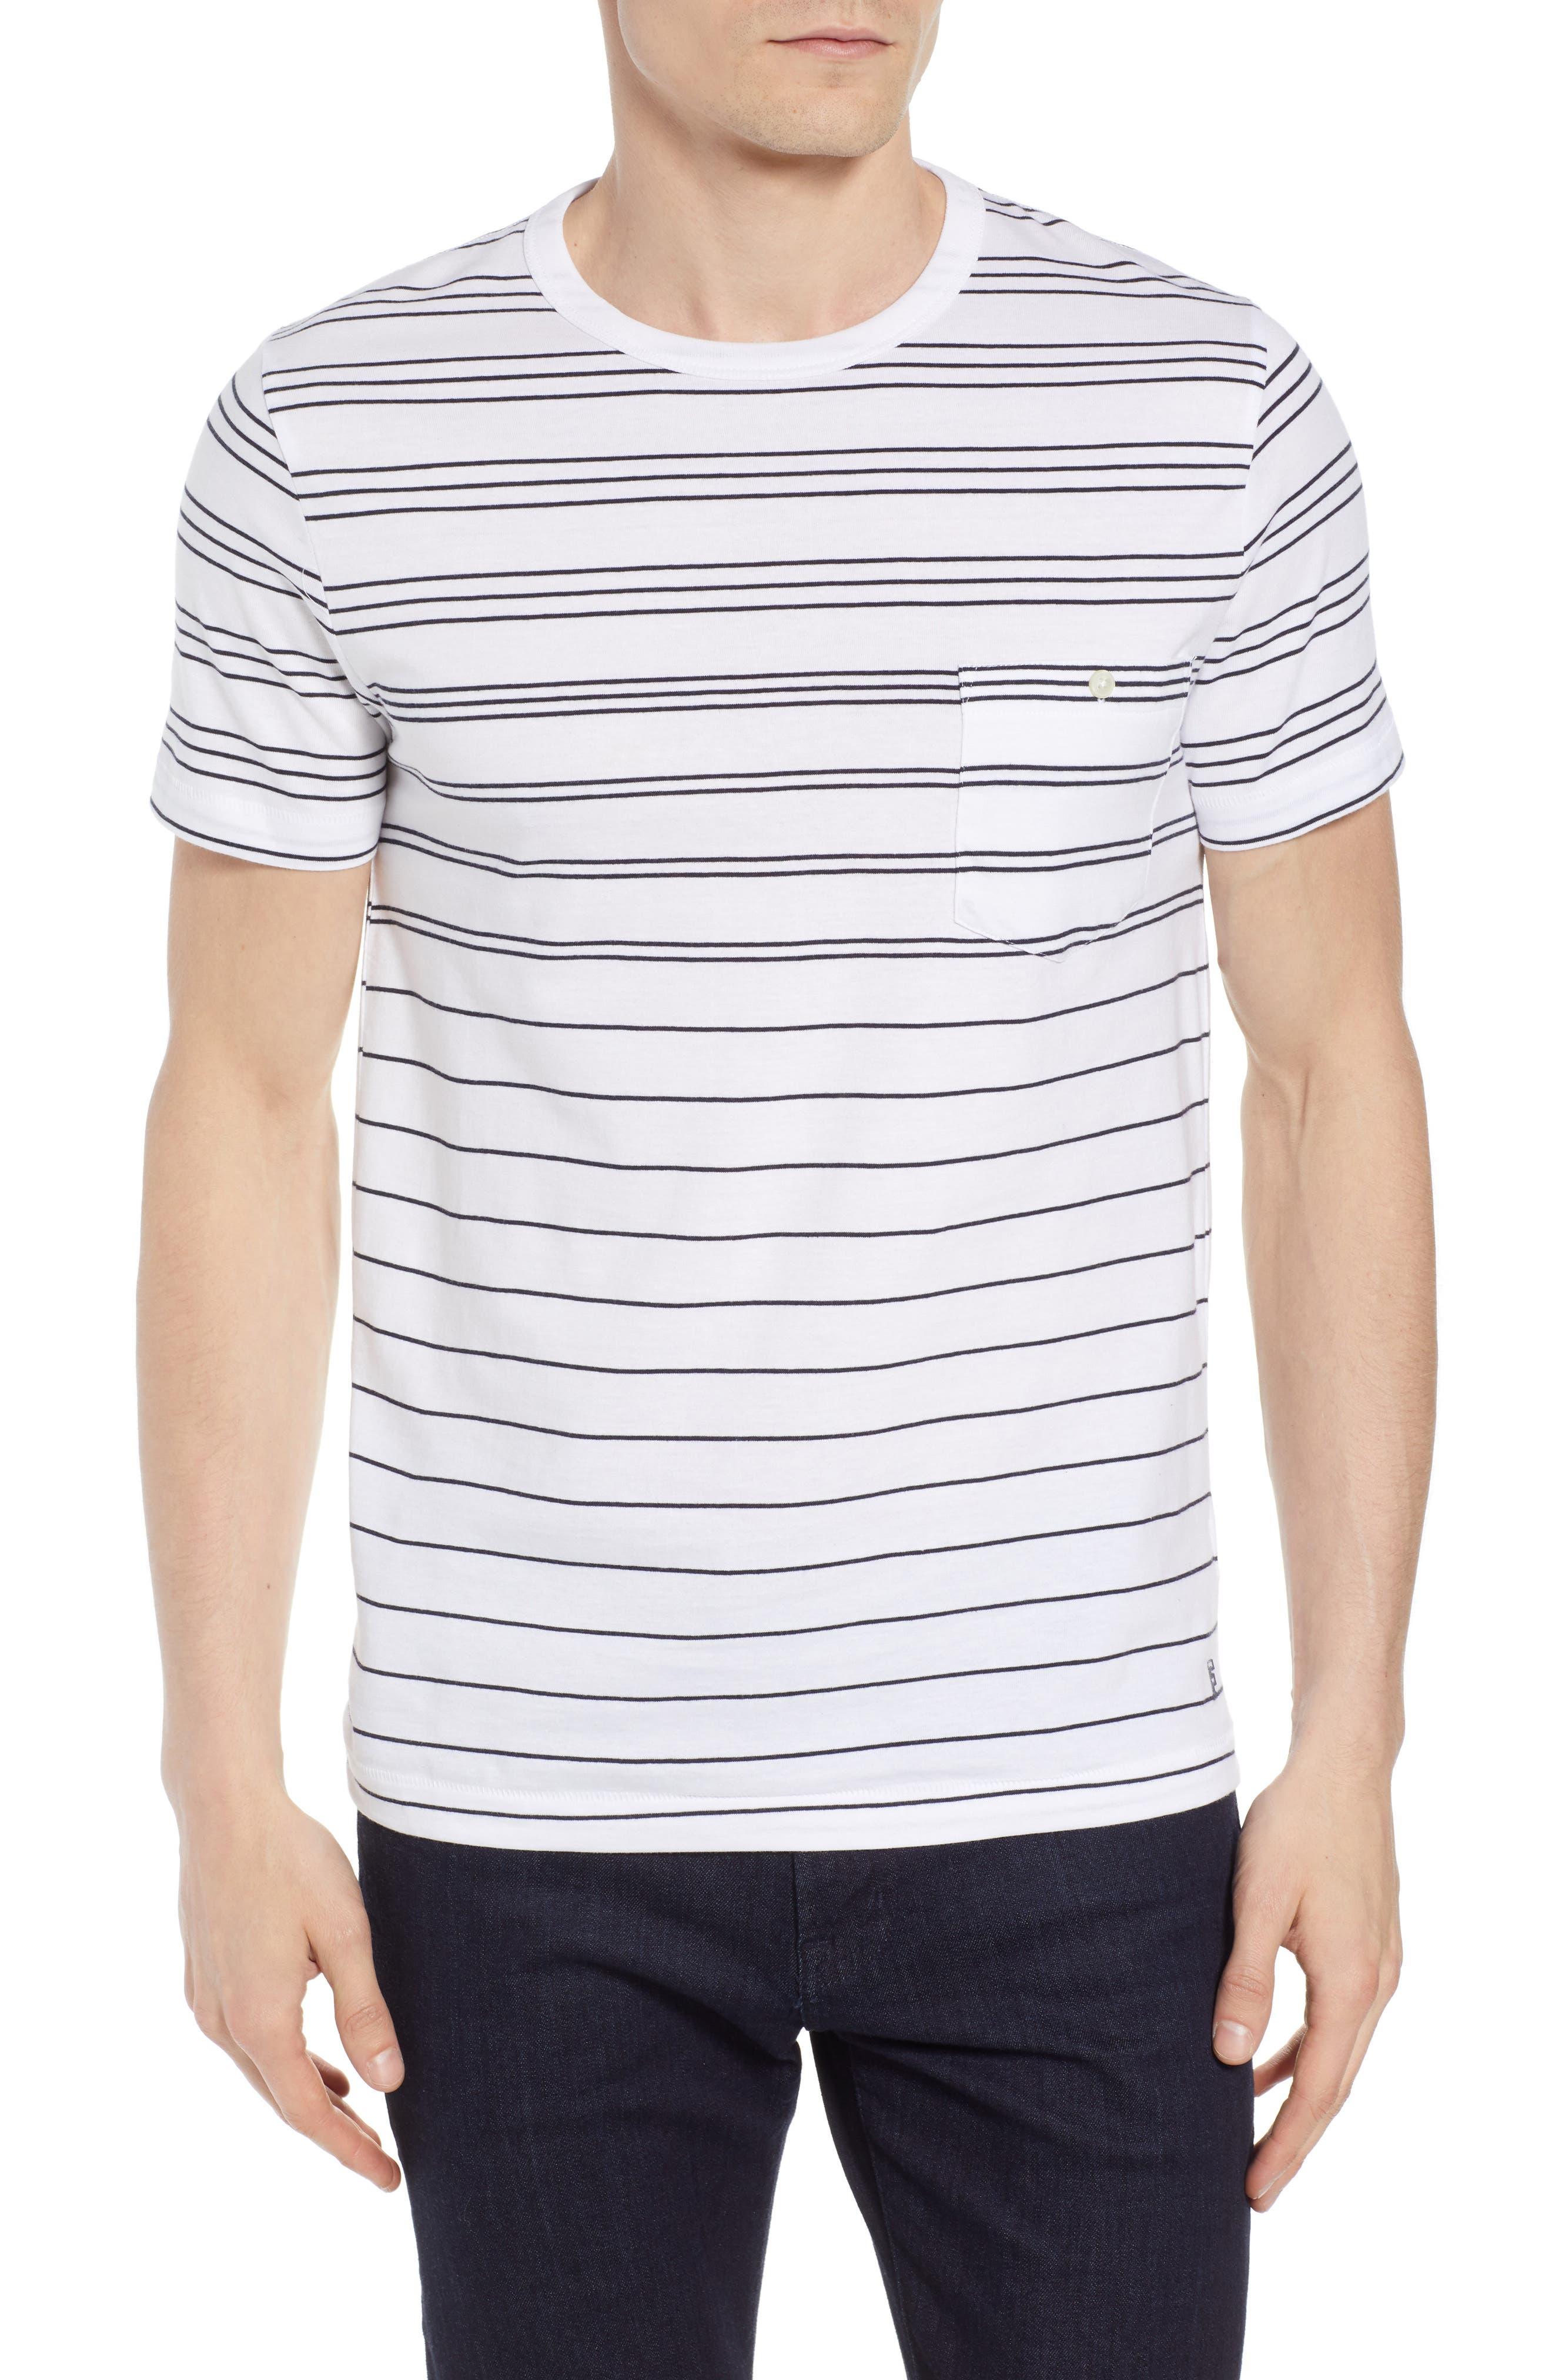 Summer Graded Stripe Pocket T-Shirt,                             Main thumbnail 1, color,                             WHITE MARINE BLUE